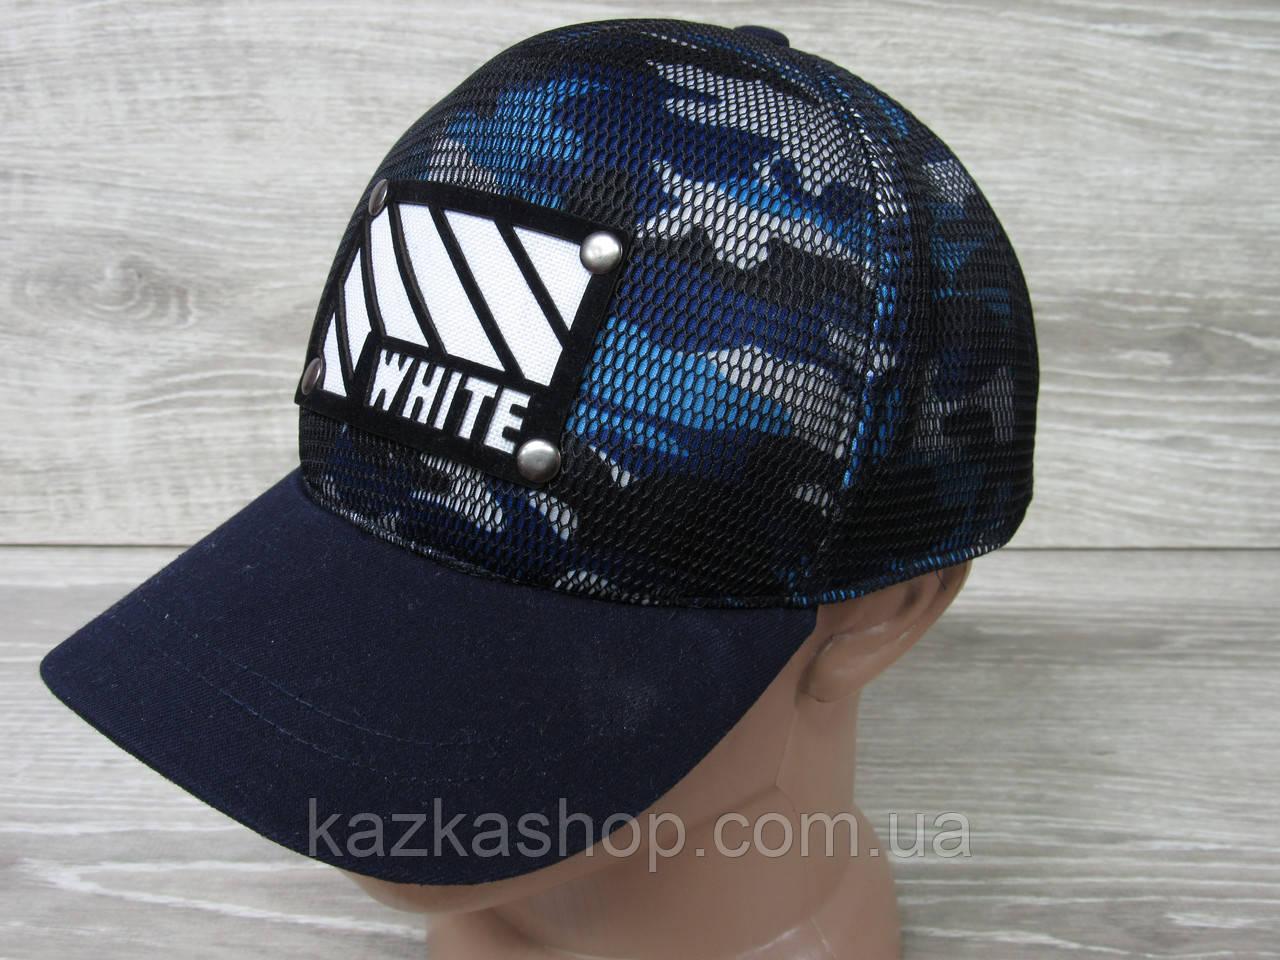 Мужская бейсболка, кепка, материал трикотаж, с декоративной вставкой WHITE, на регуляторе